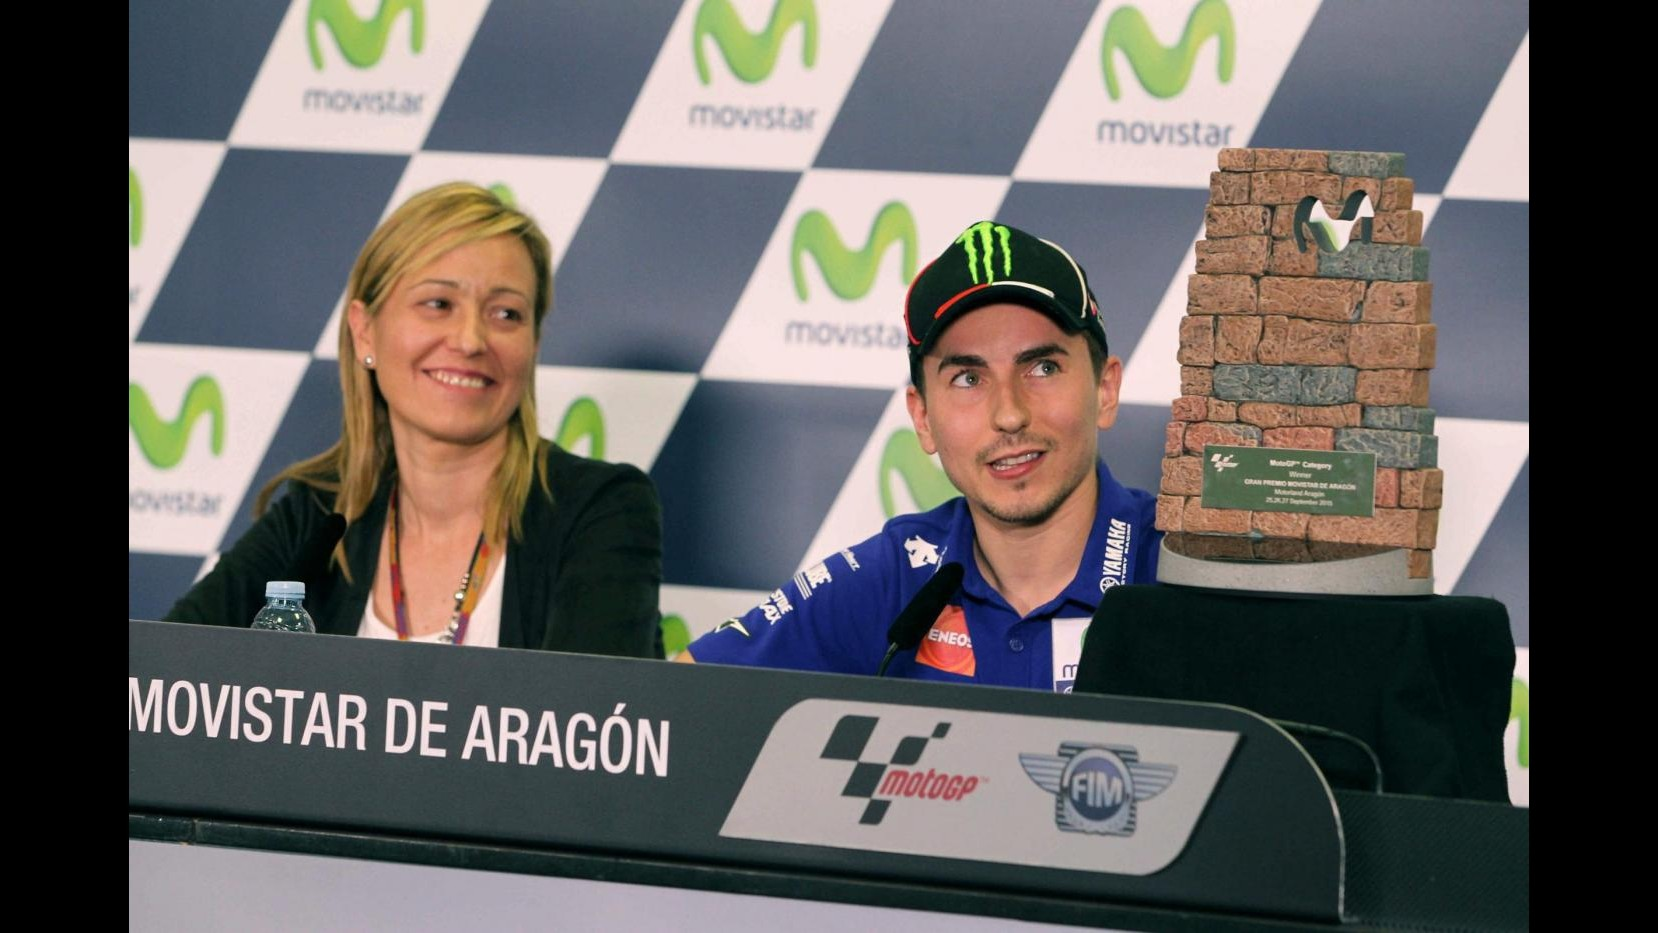 MotoGp, Aragon: Lorenzo trionfa davanti a Pedrosa, terzo Rossi